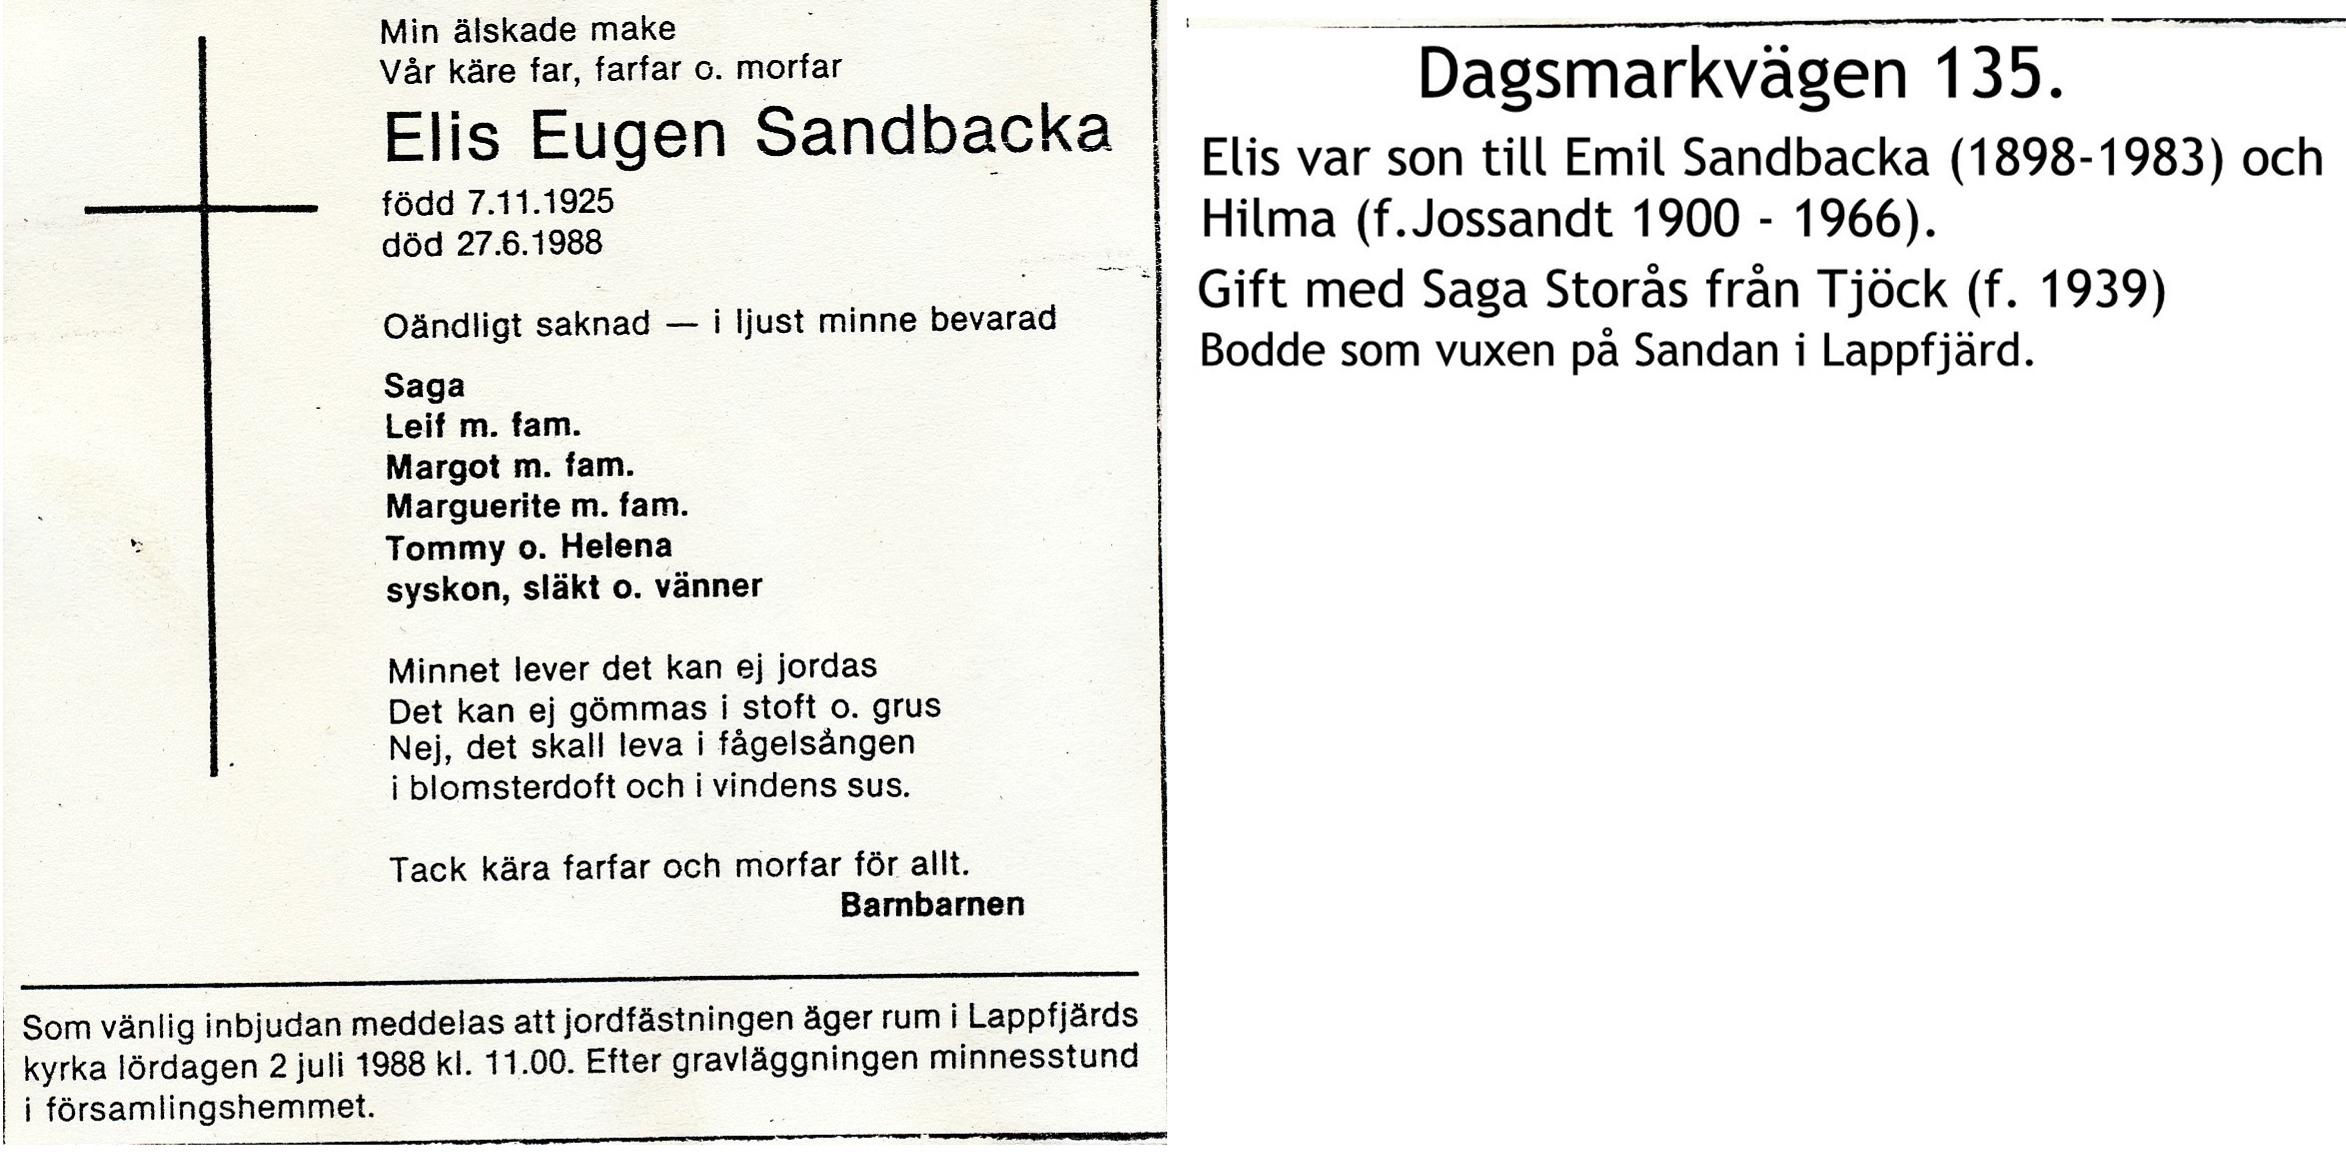 Sandbacka Elis